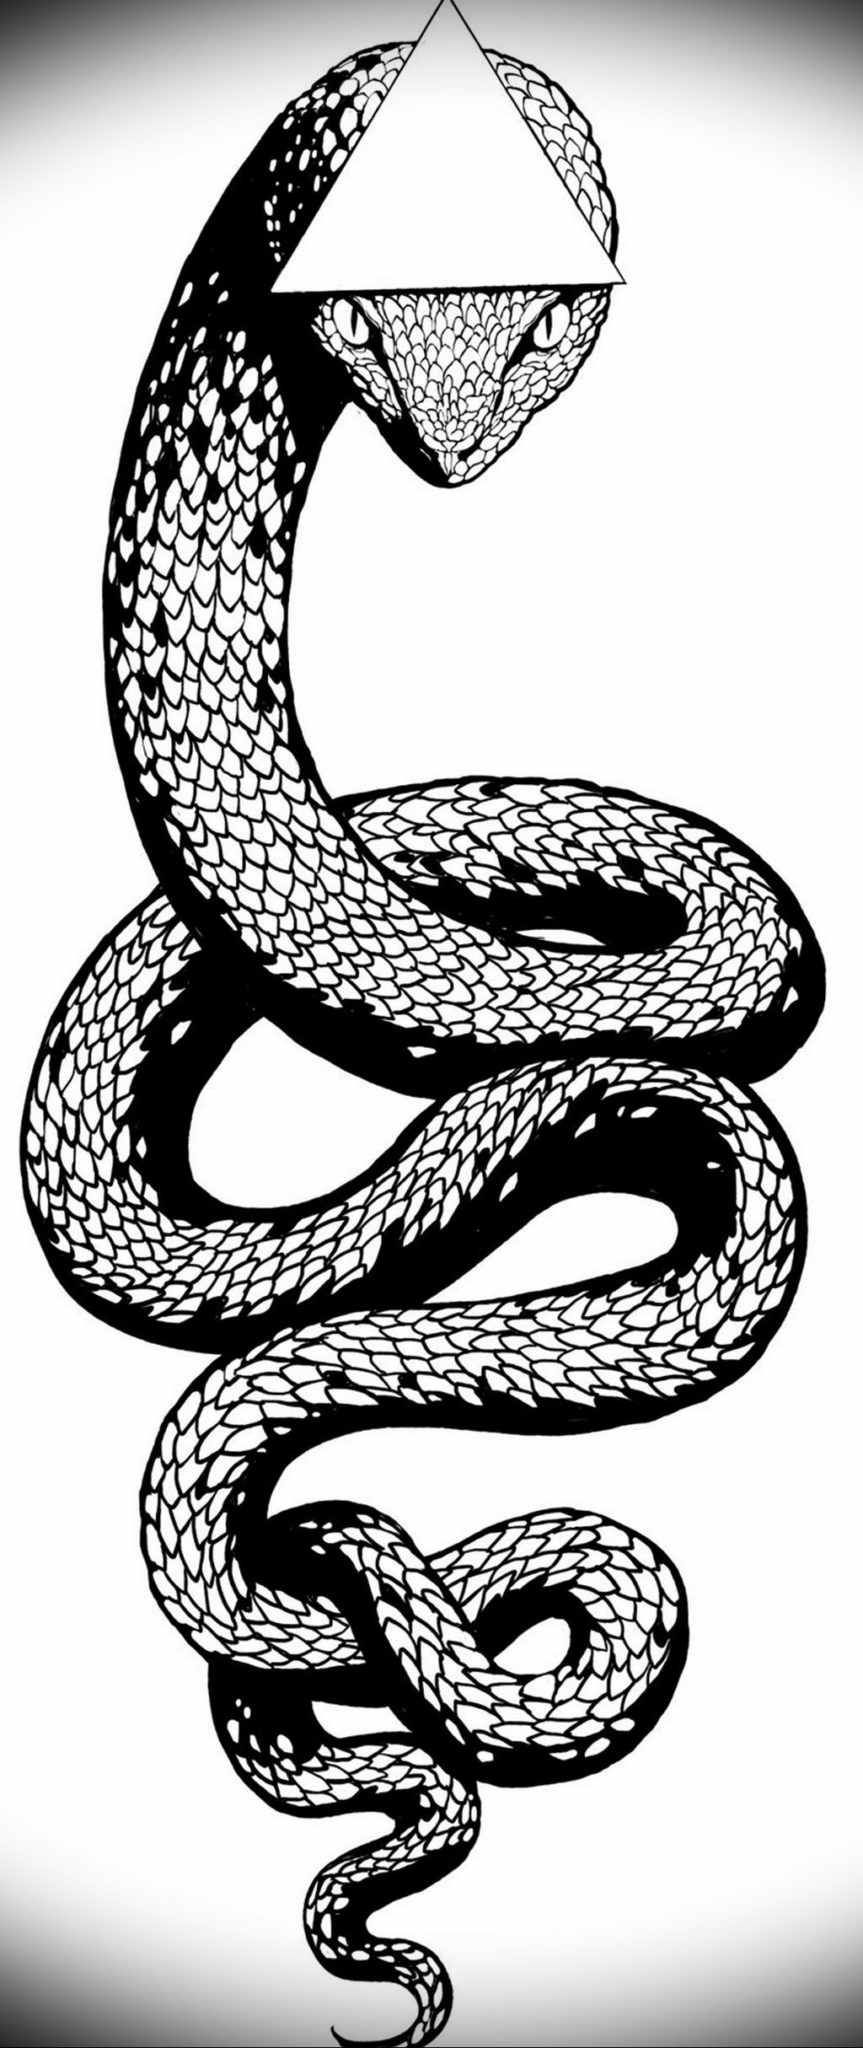 змея тату эскиз маленькая 14.08.2019 №031 - sketches small tattoo -  tatufoto.com - tatufoto.com